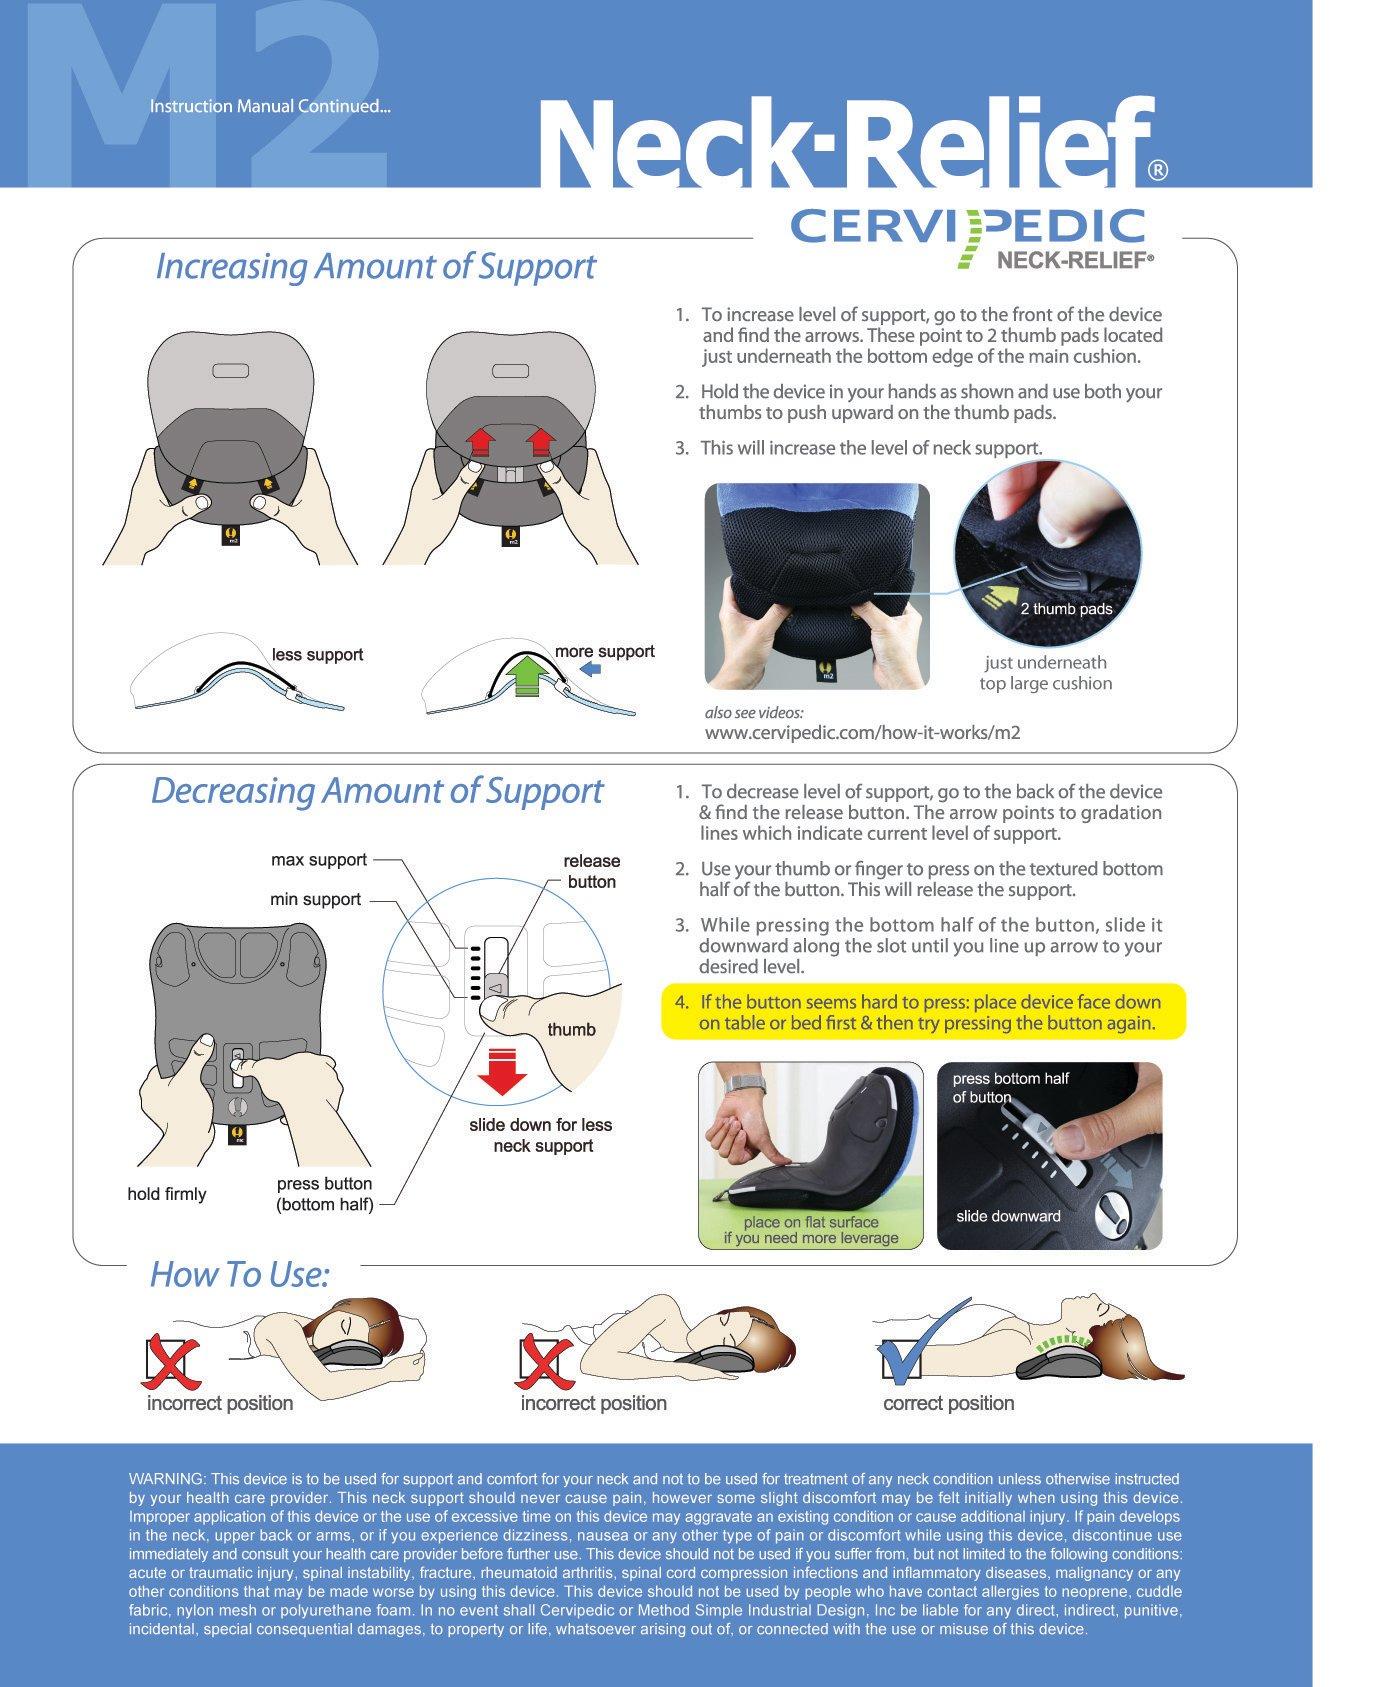 Neck-Relief M2 - Instructions cont.